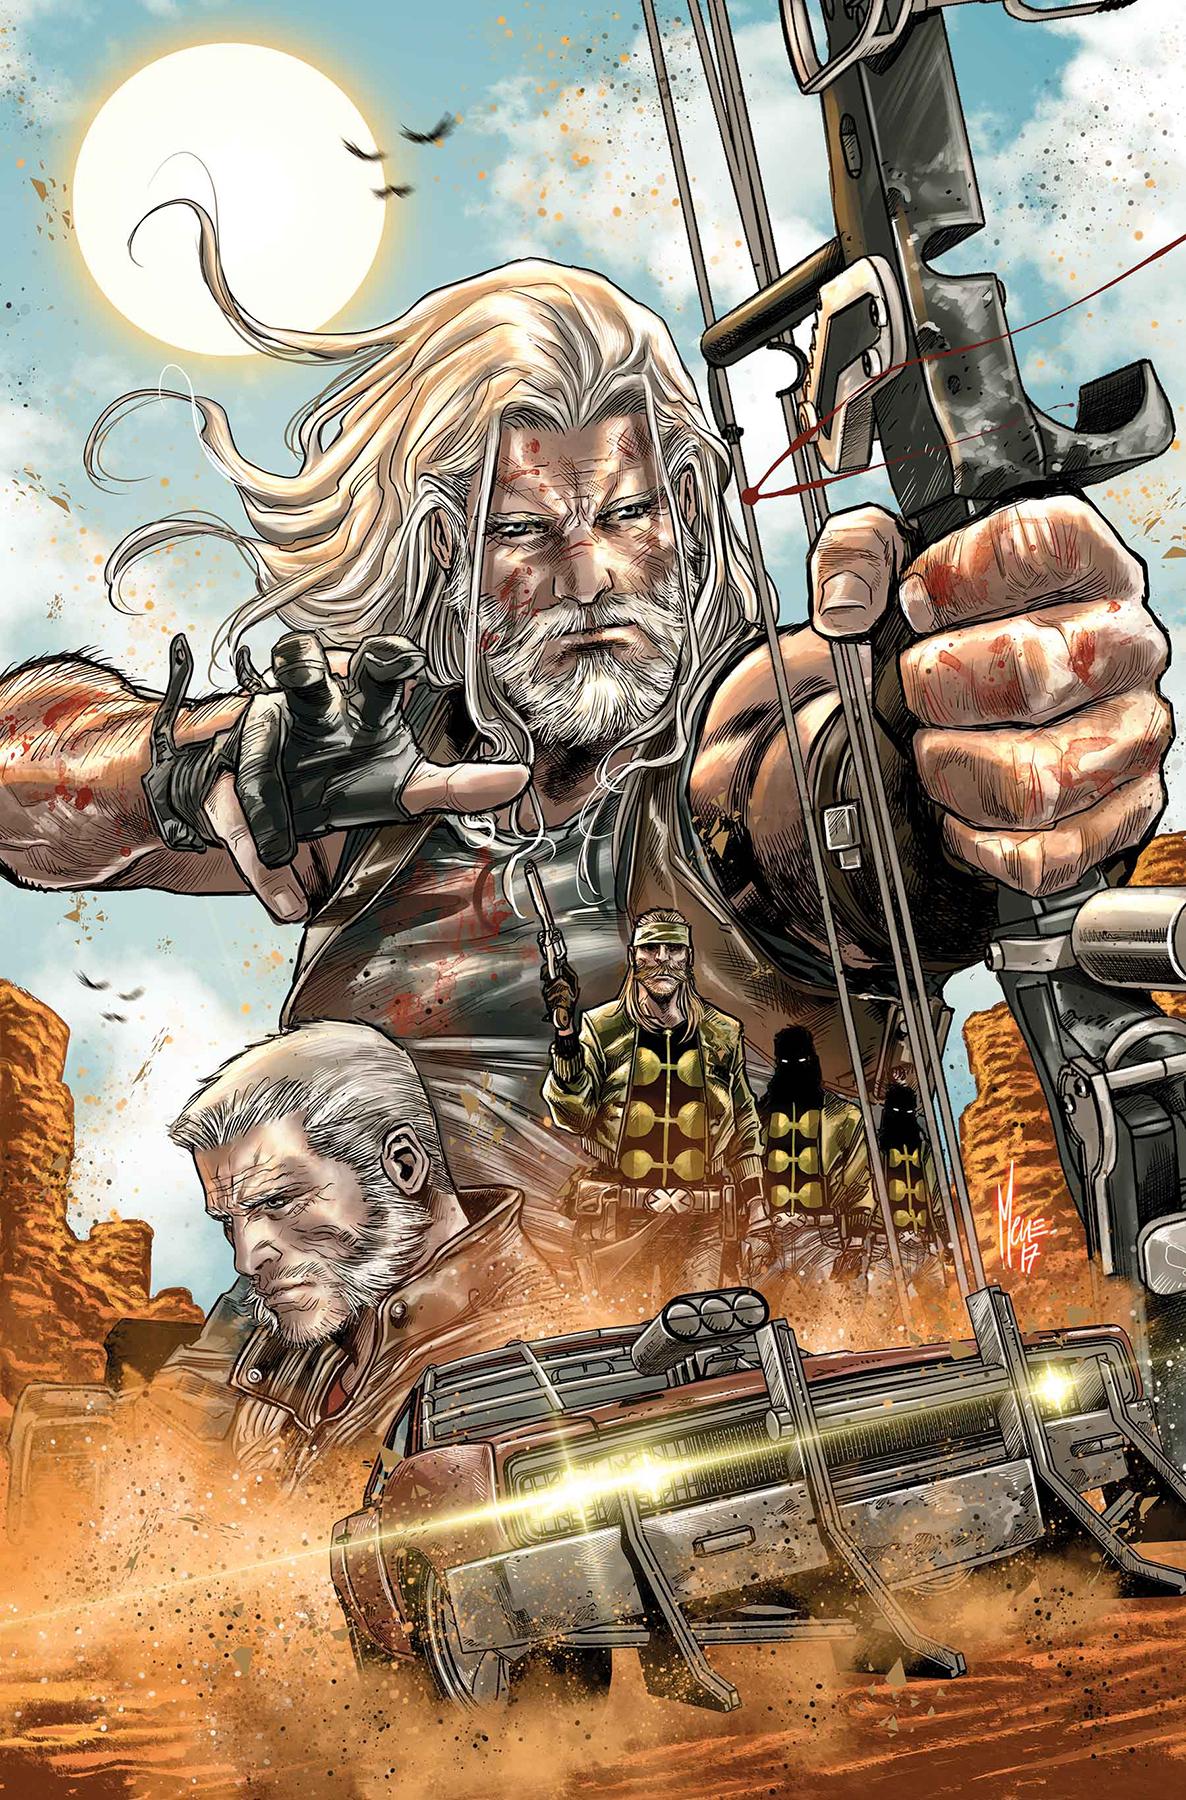 Marco Checchetto - Old man Hawkeye #1 cover